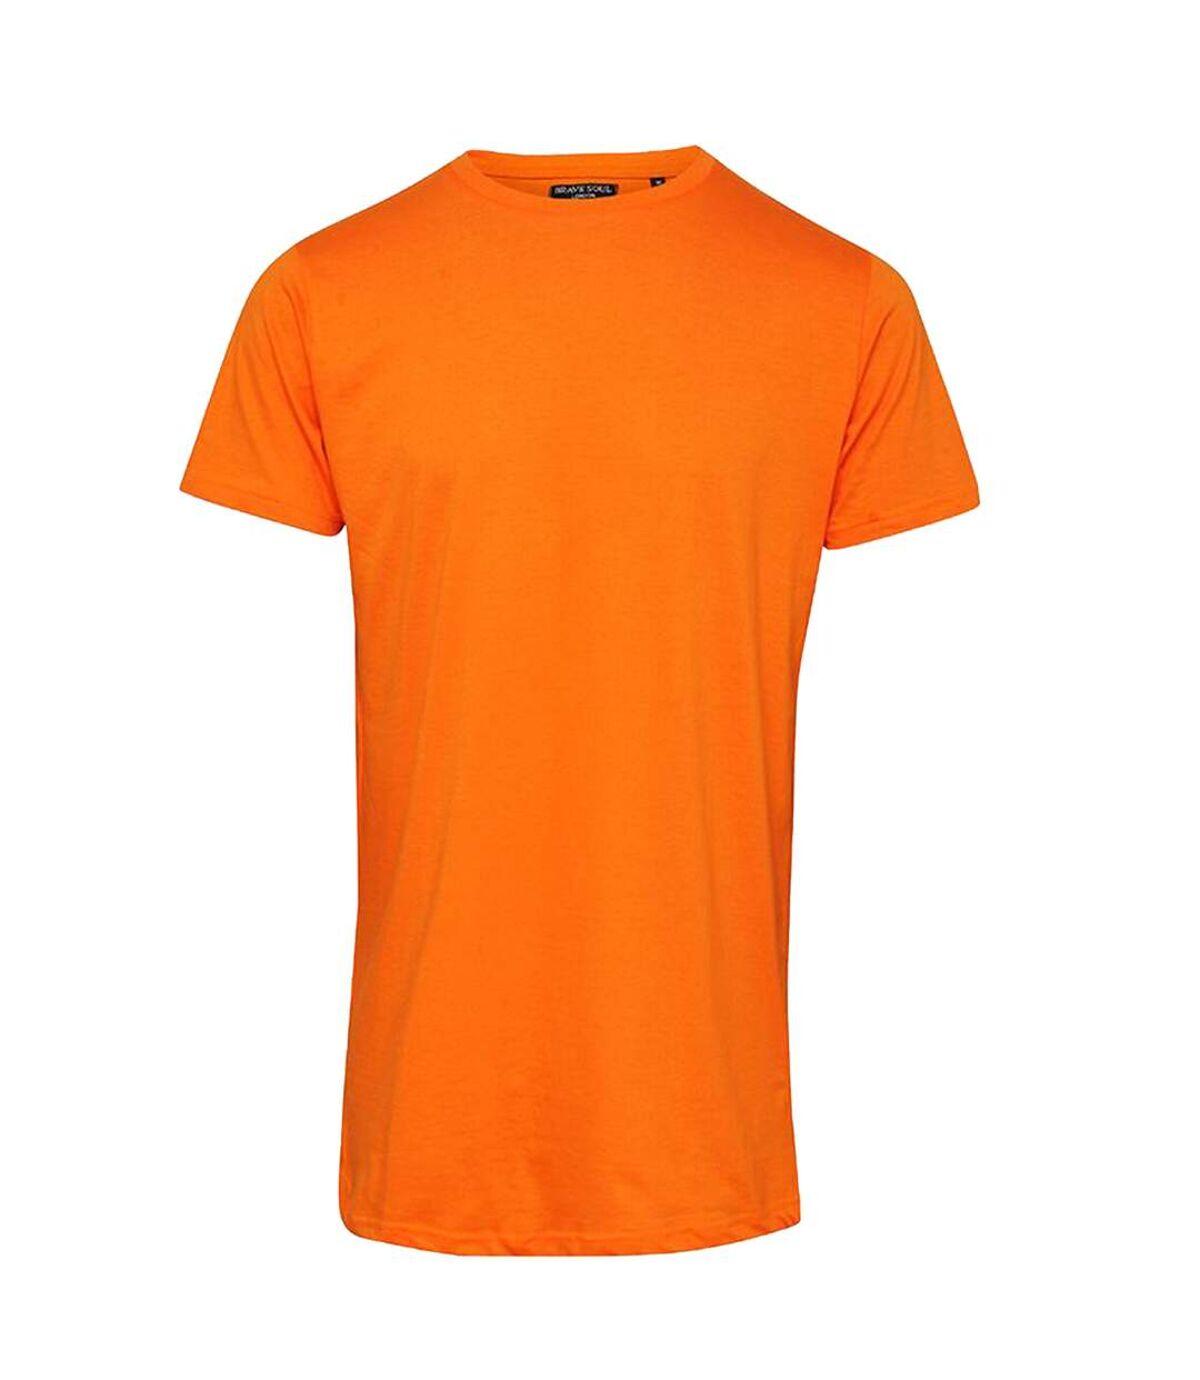 Brave Soul Mens Harrel Short Sleeve Crew Neck T-Shirt (Orange) - UTRW5687